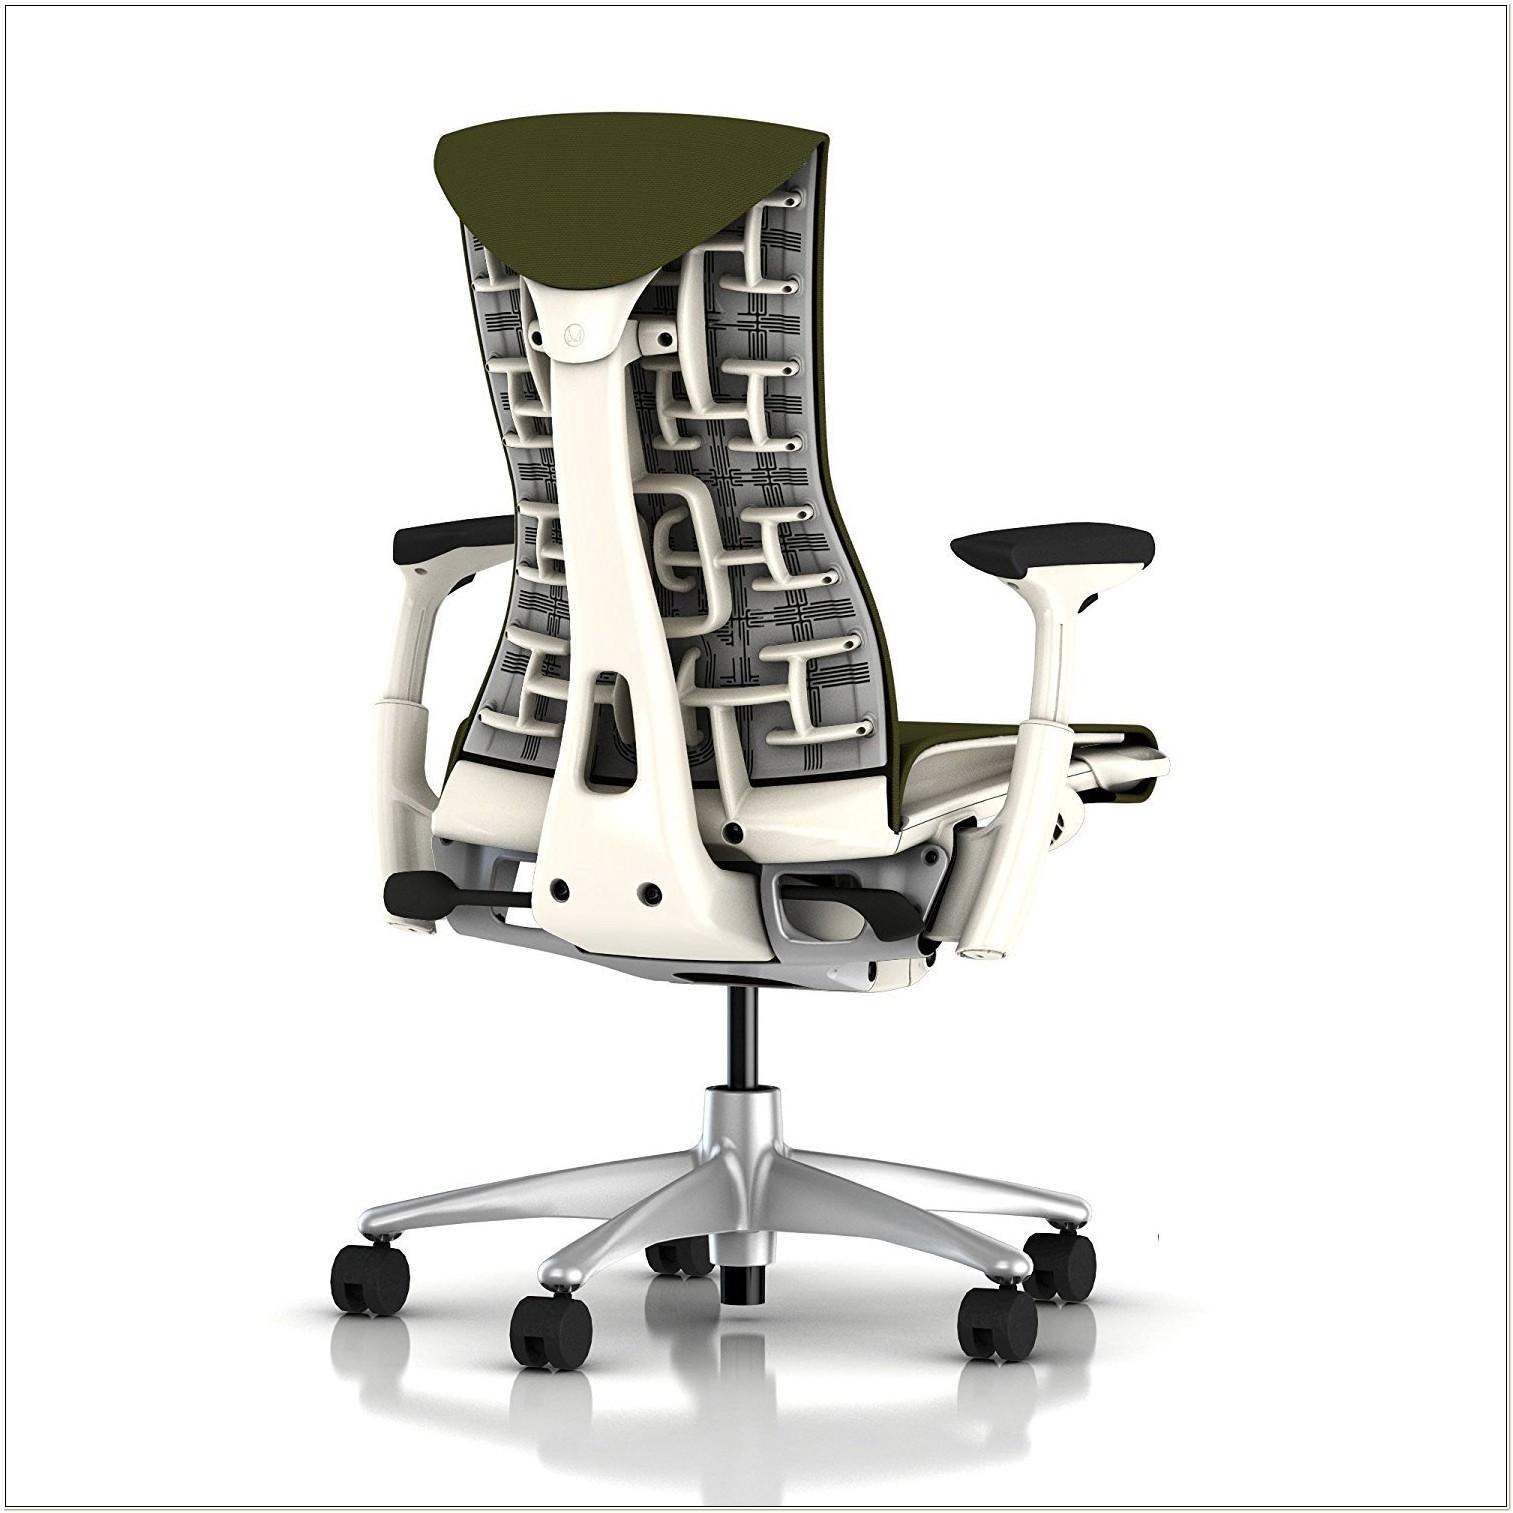 Refurbished Herman Miller Embody Chair